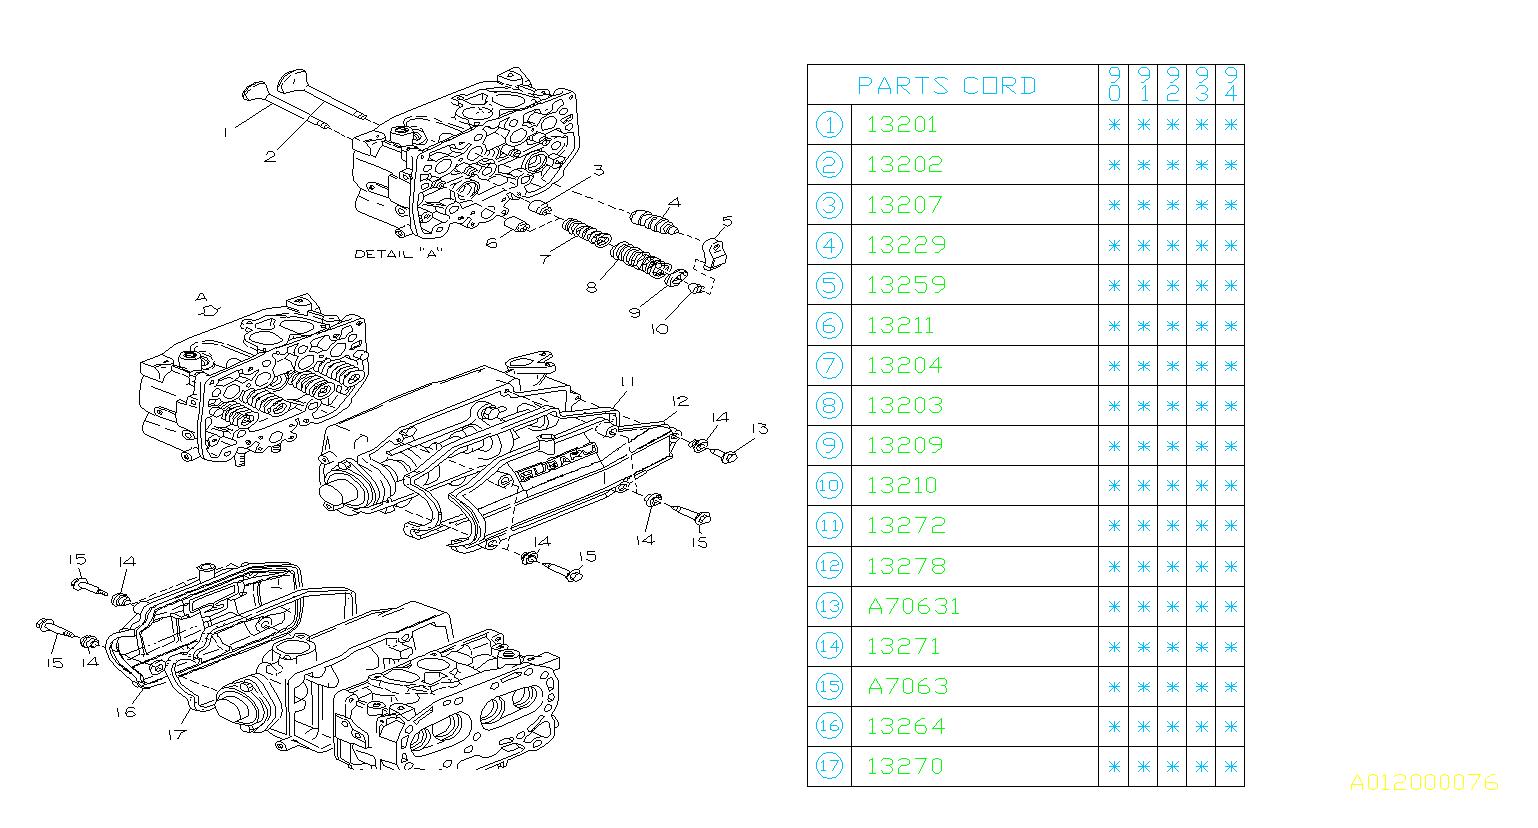 Subaru       Loyale    Bolt Valve  mechanism  800706310   Ciocca    Subaru     Allentown PA